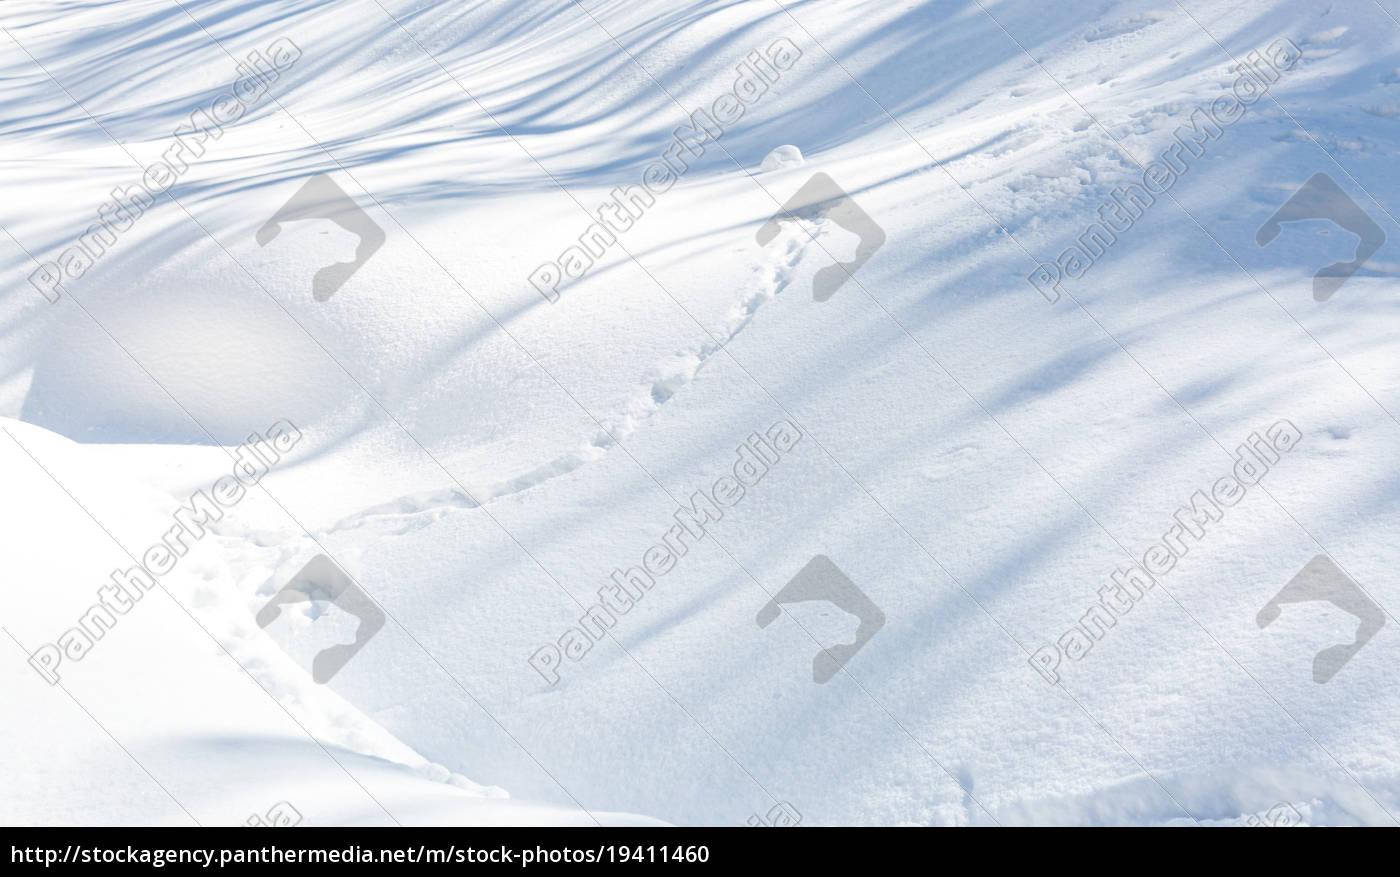 Snow Texture Royalty Free Photo 19411460 Panthermedia Stock Agency